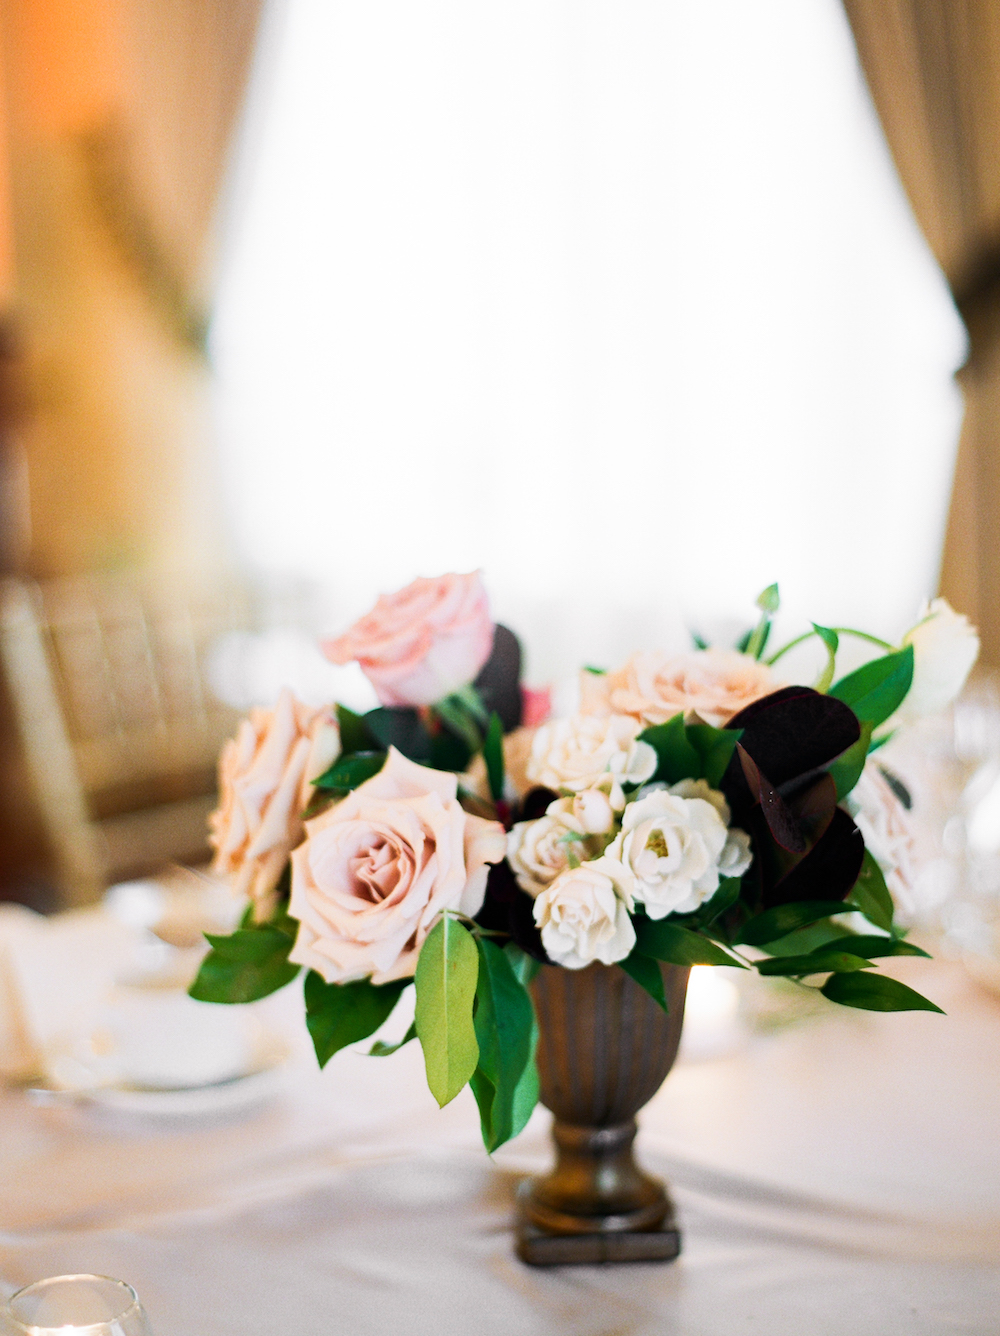 Elegant Wedding Centrepiece - Stone House Creative